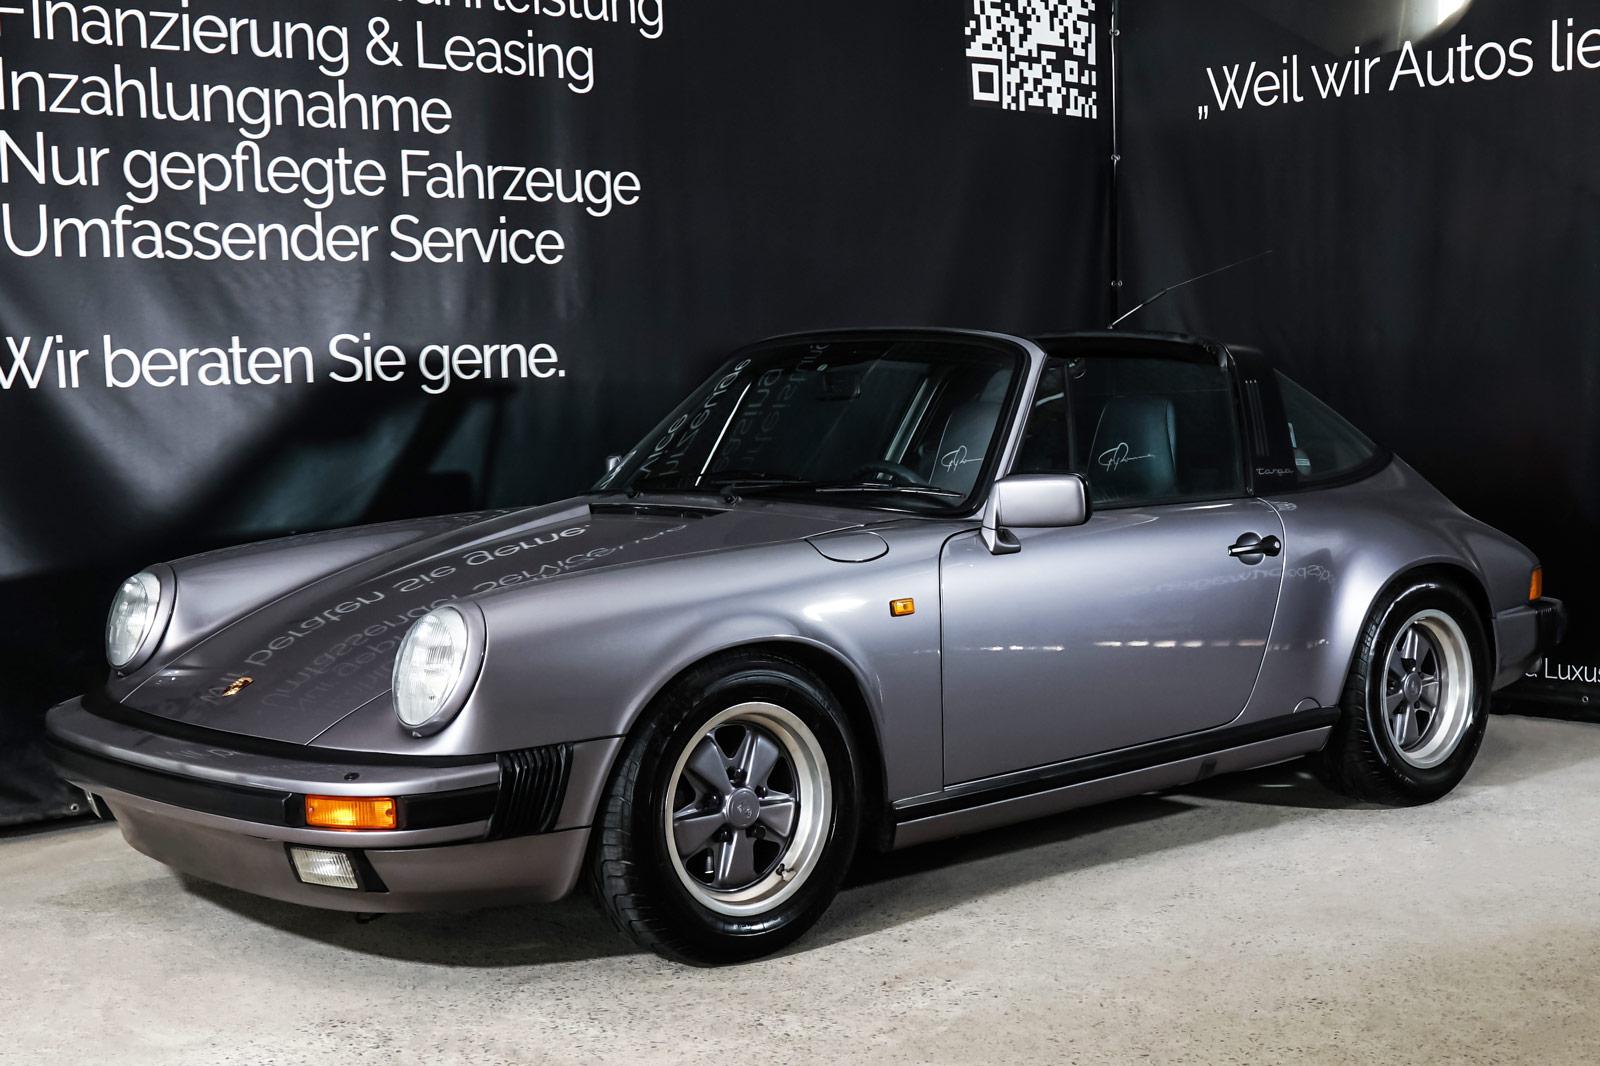 Porsche_911_Targa_Diamantblaumetallic_Blau_POR-0092_7_w